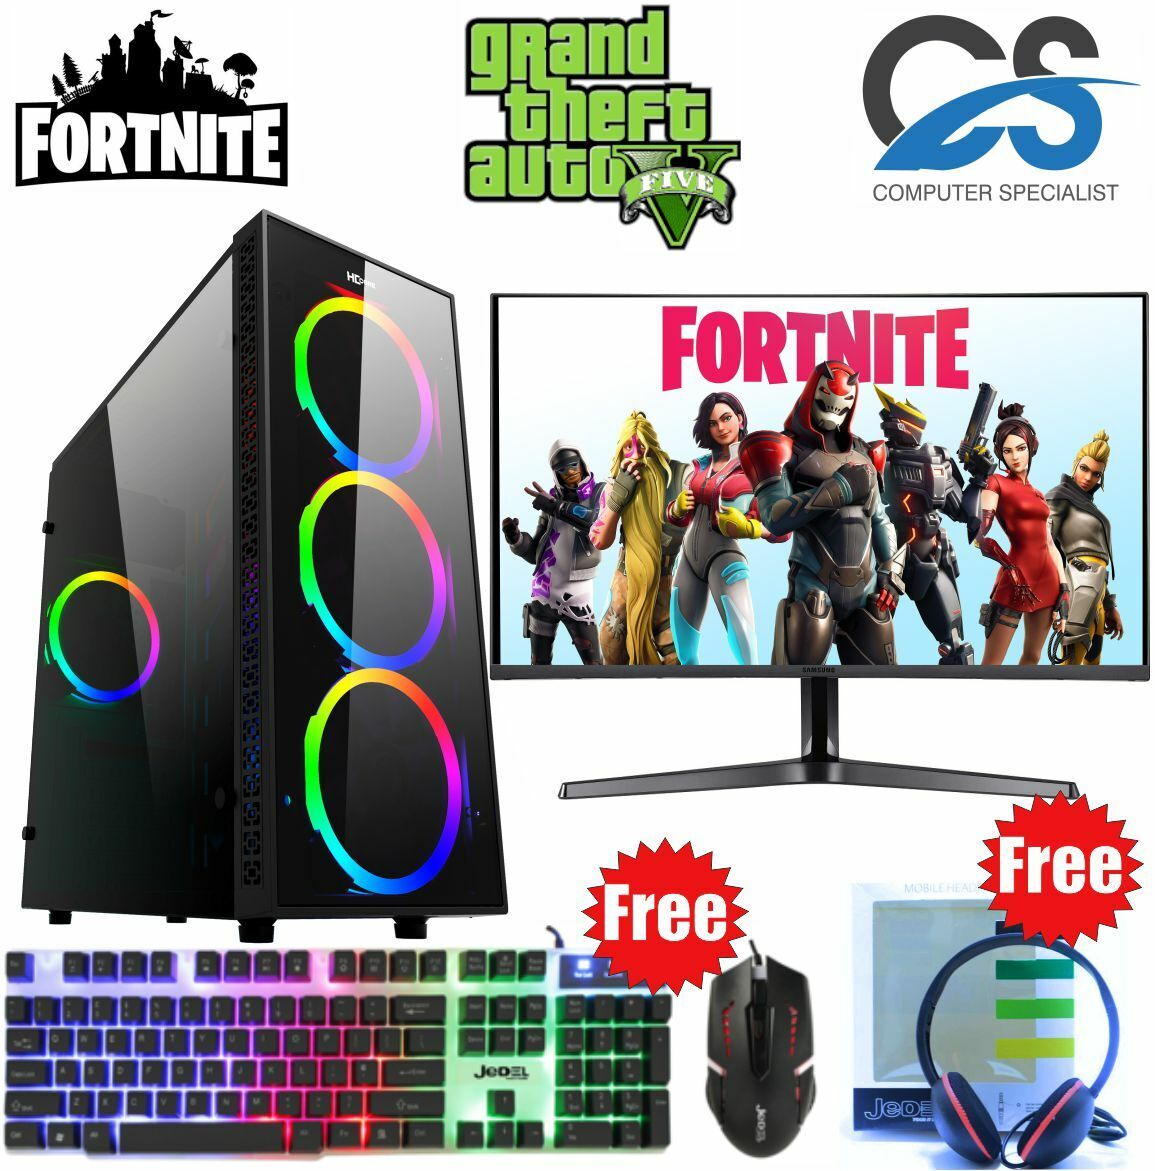 Computer Games - Fast Gaming PC Computer Bundle Intel Quad Core i7 16GB 1TB Win 10 GTX 1650